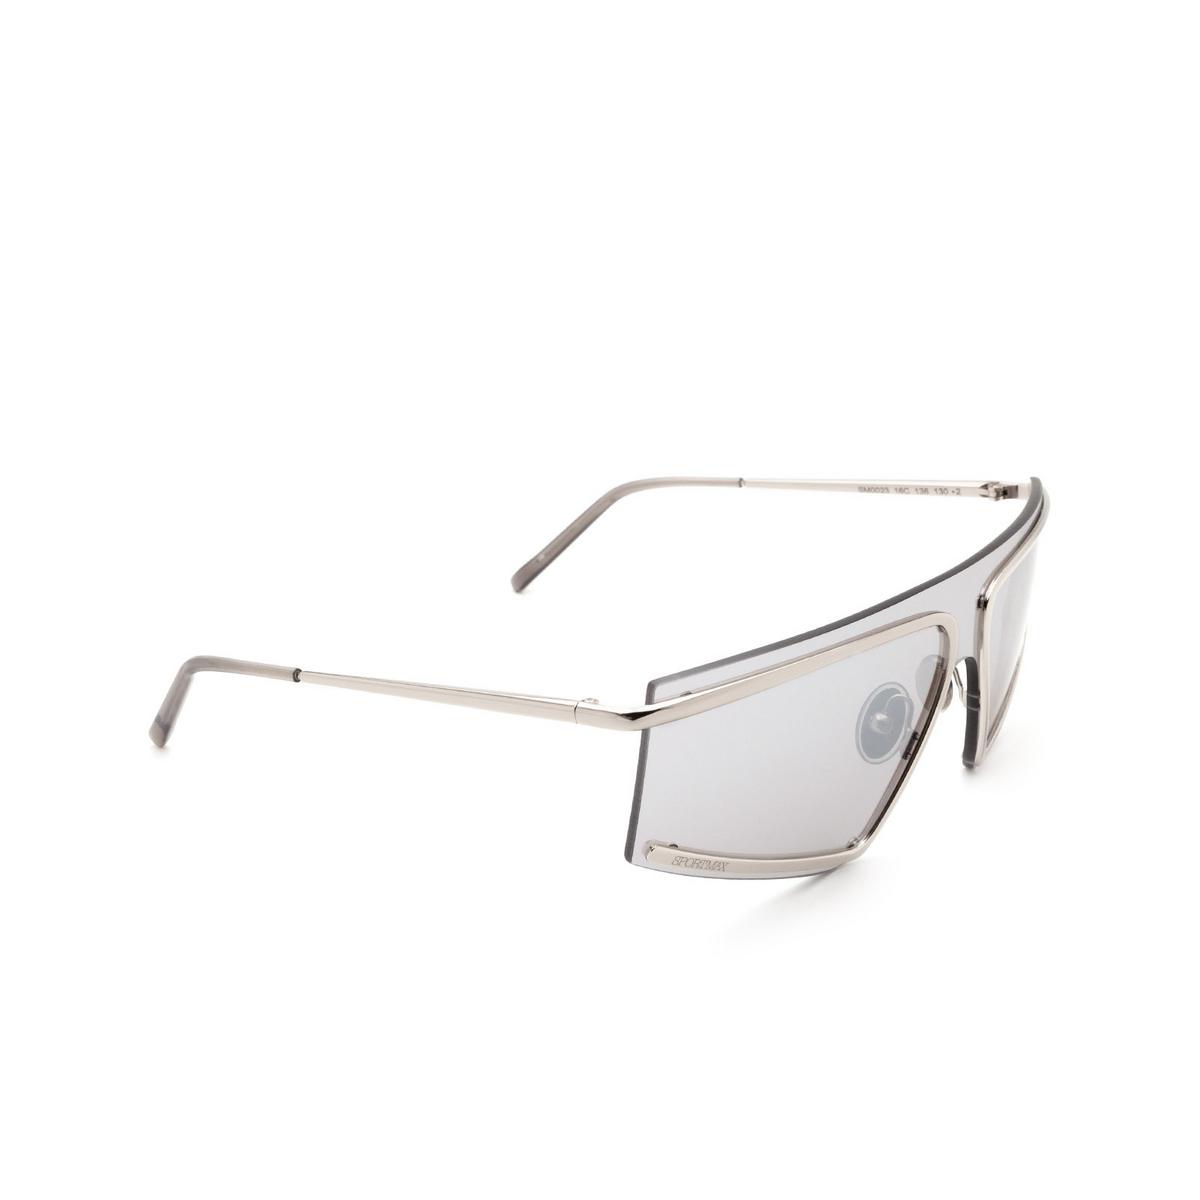 Sportmax® Mask Sunglasses: SM0023 color Shiny Palladium 16C - three-quarters view.